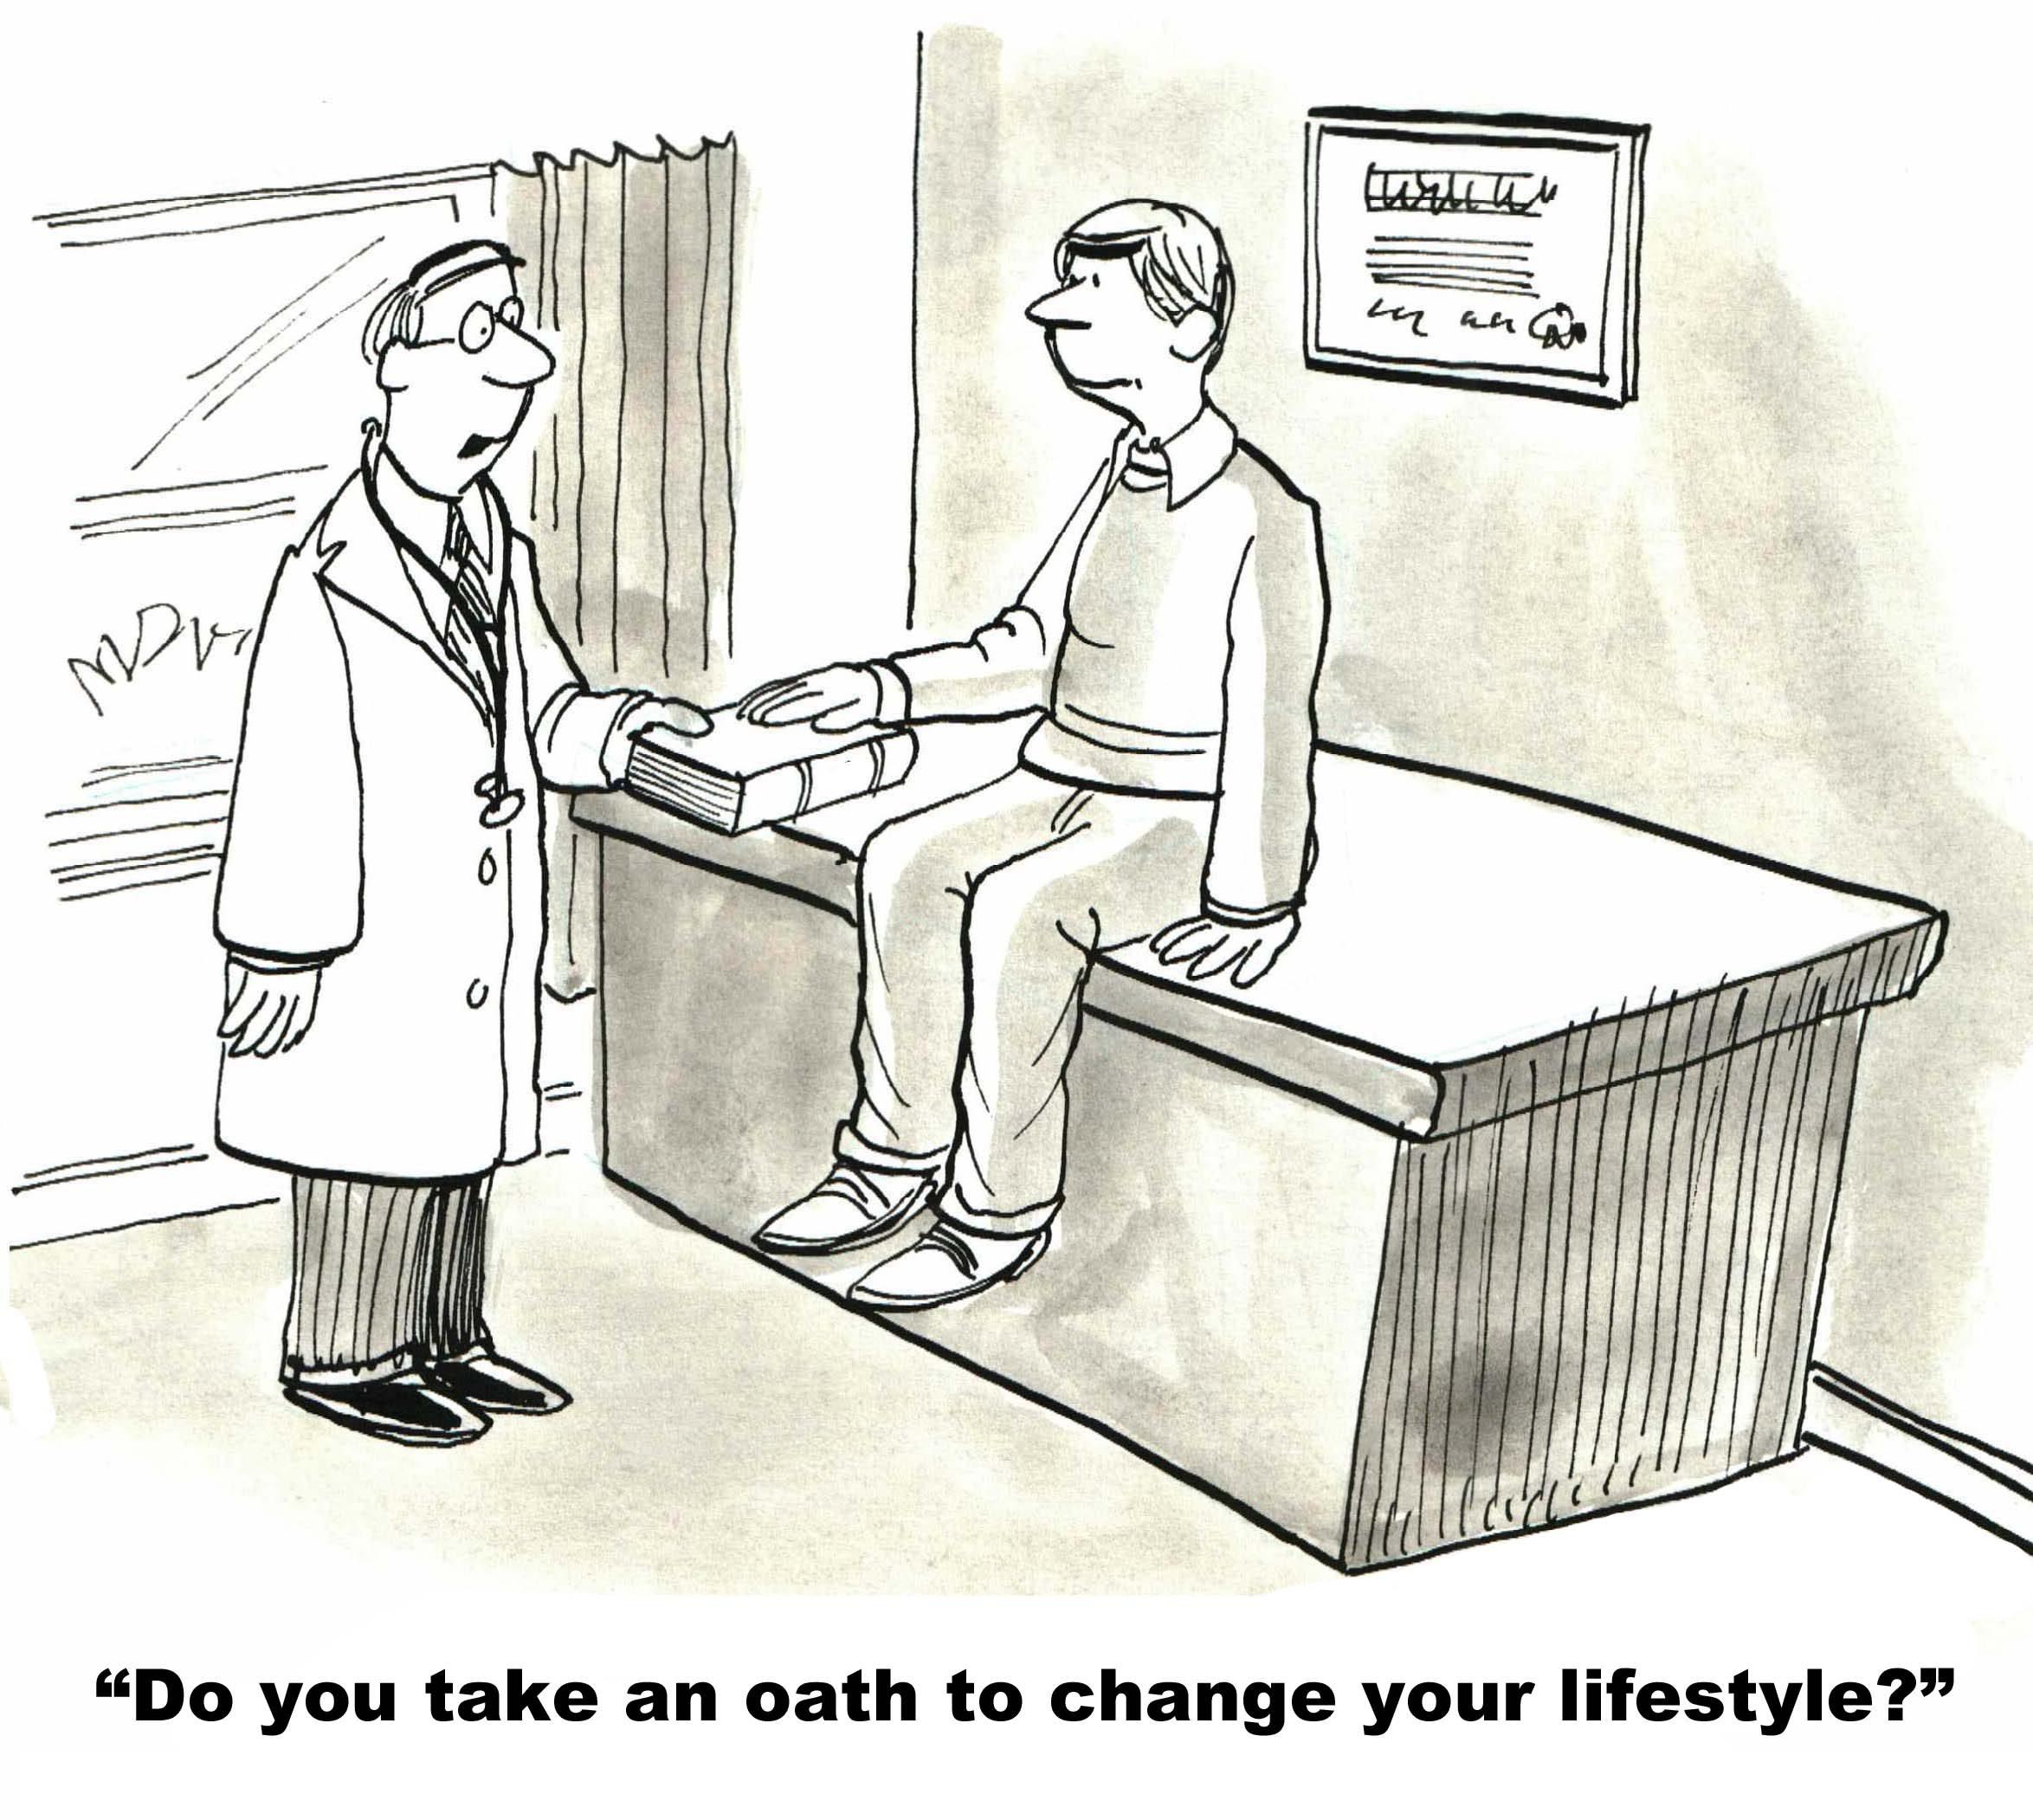 dieting oath cartoon